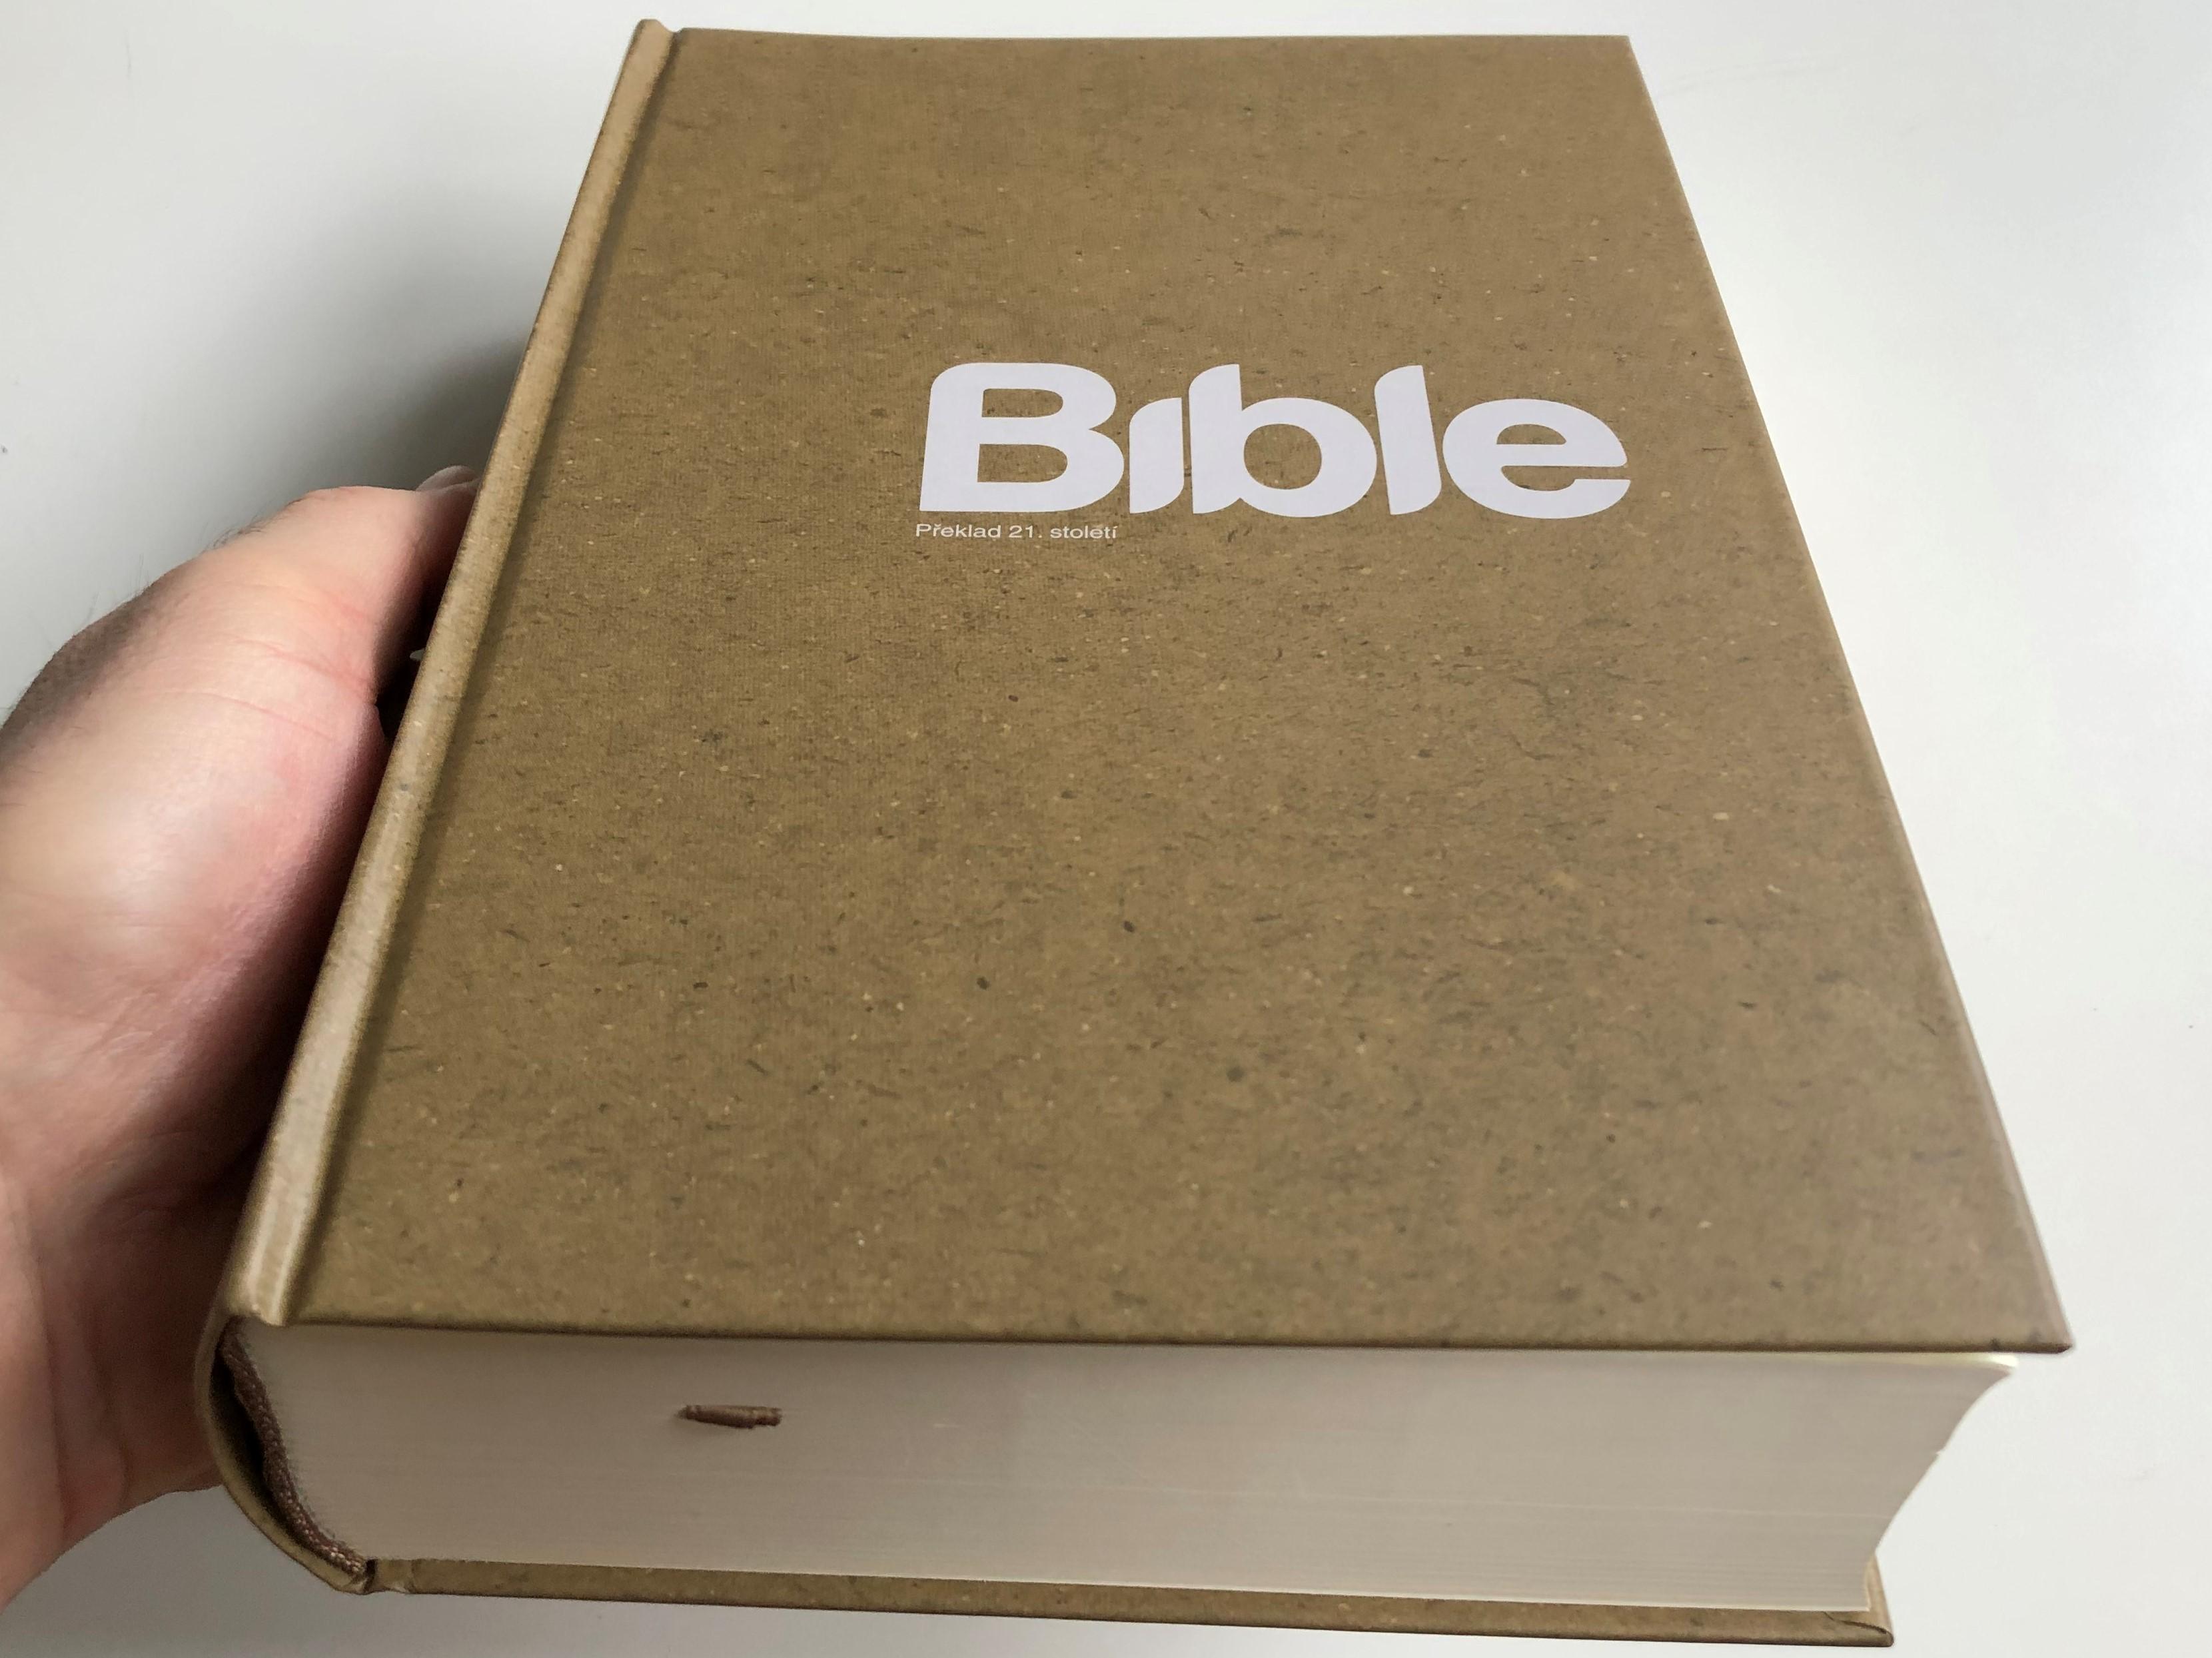 czech-language-large-print-bible-xl-bible21-bible-p-eklad-21.-stolet-4.jpg